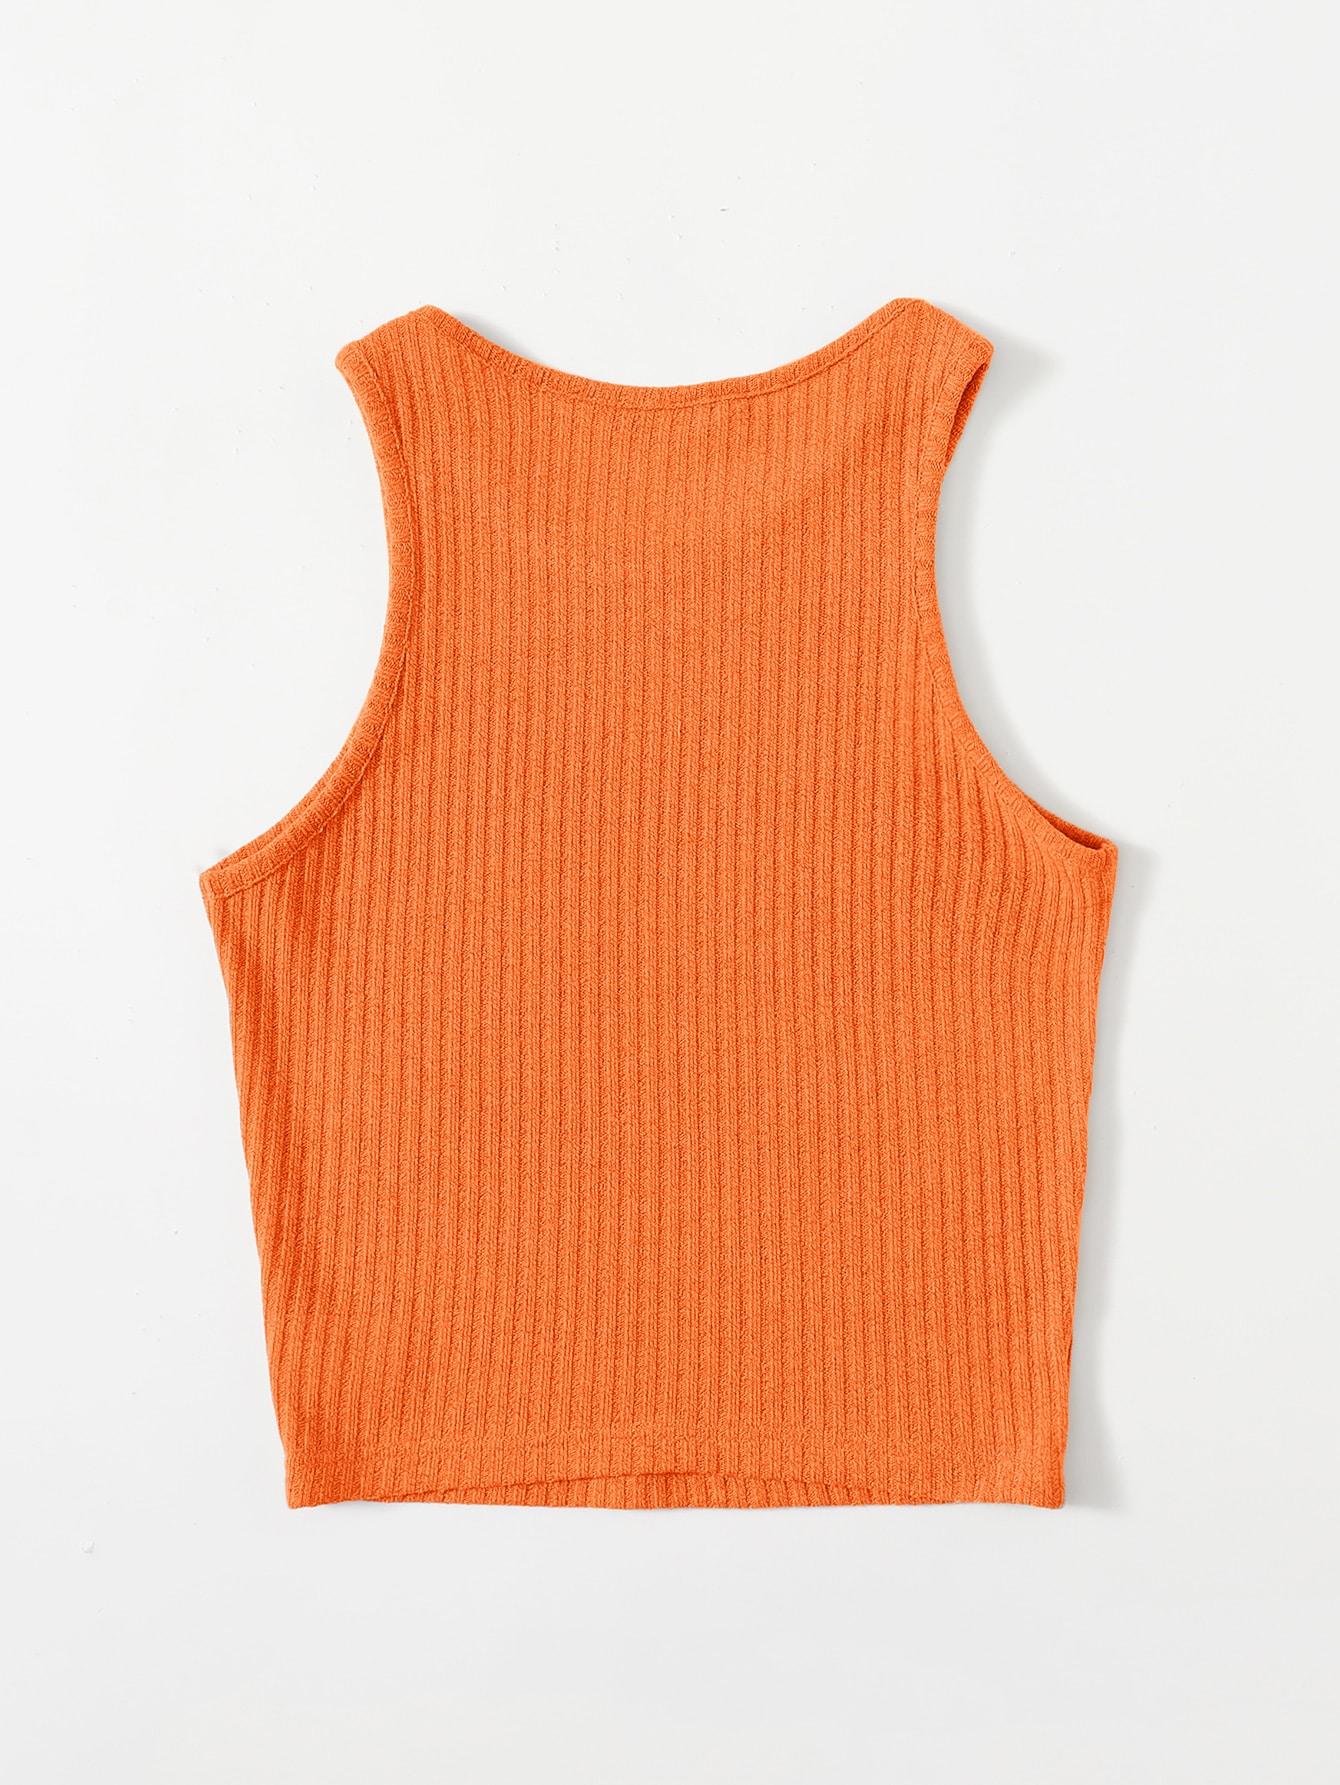 Neon Orange Solid Rib-knit Tank Top